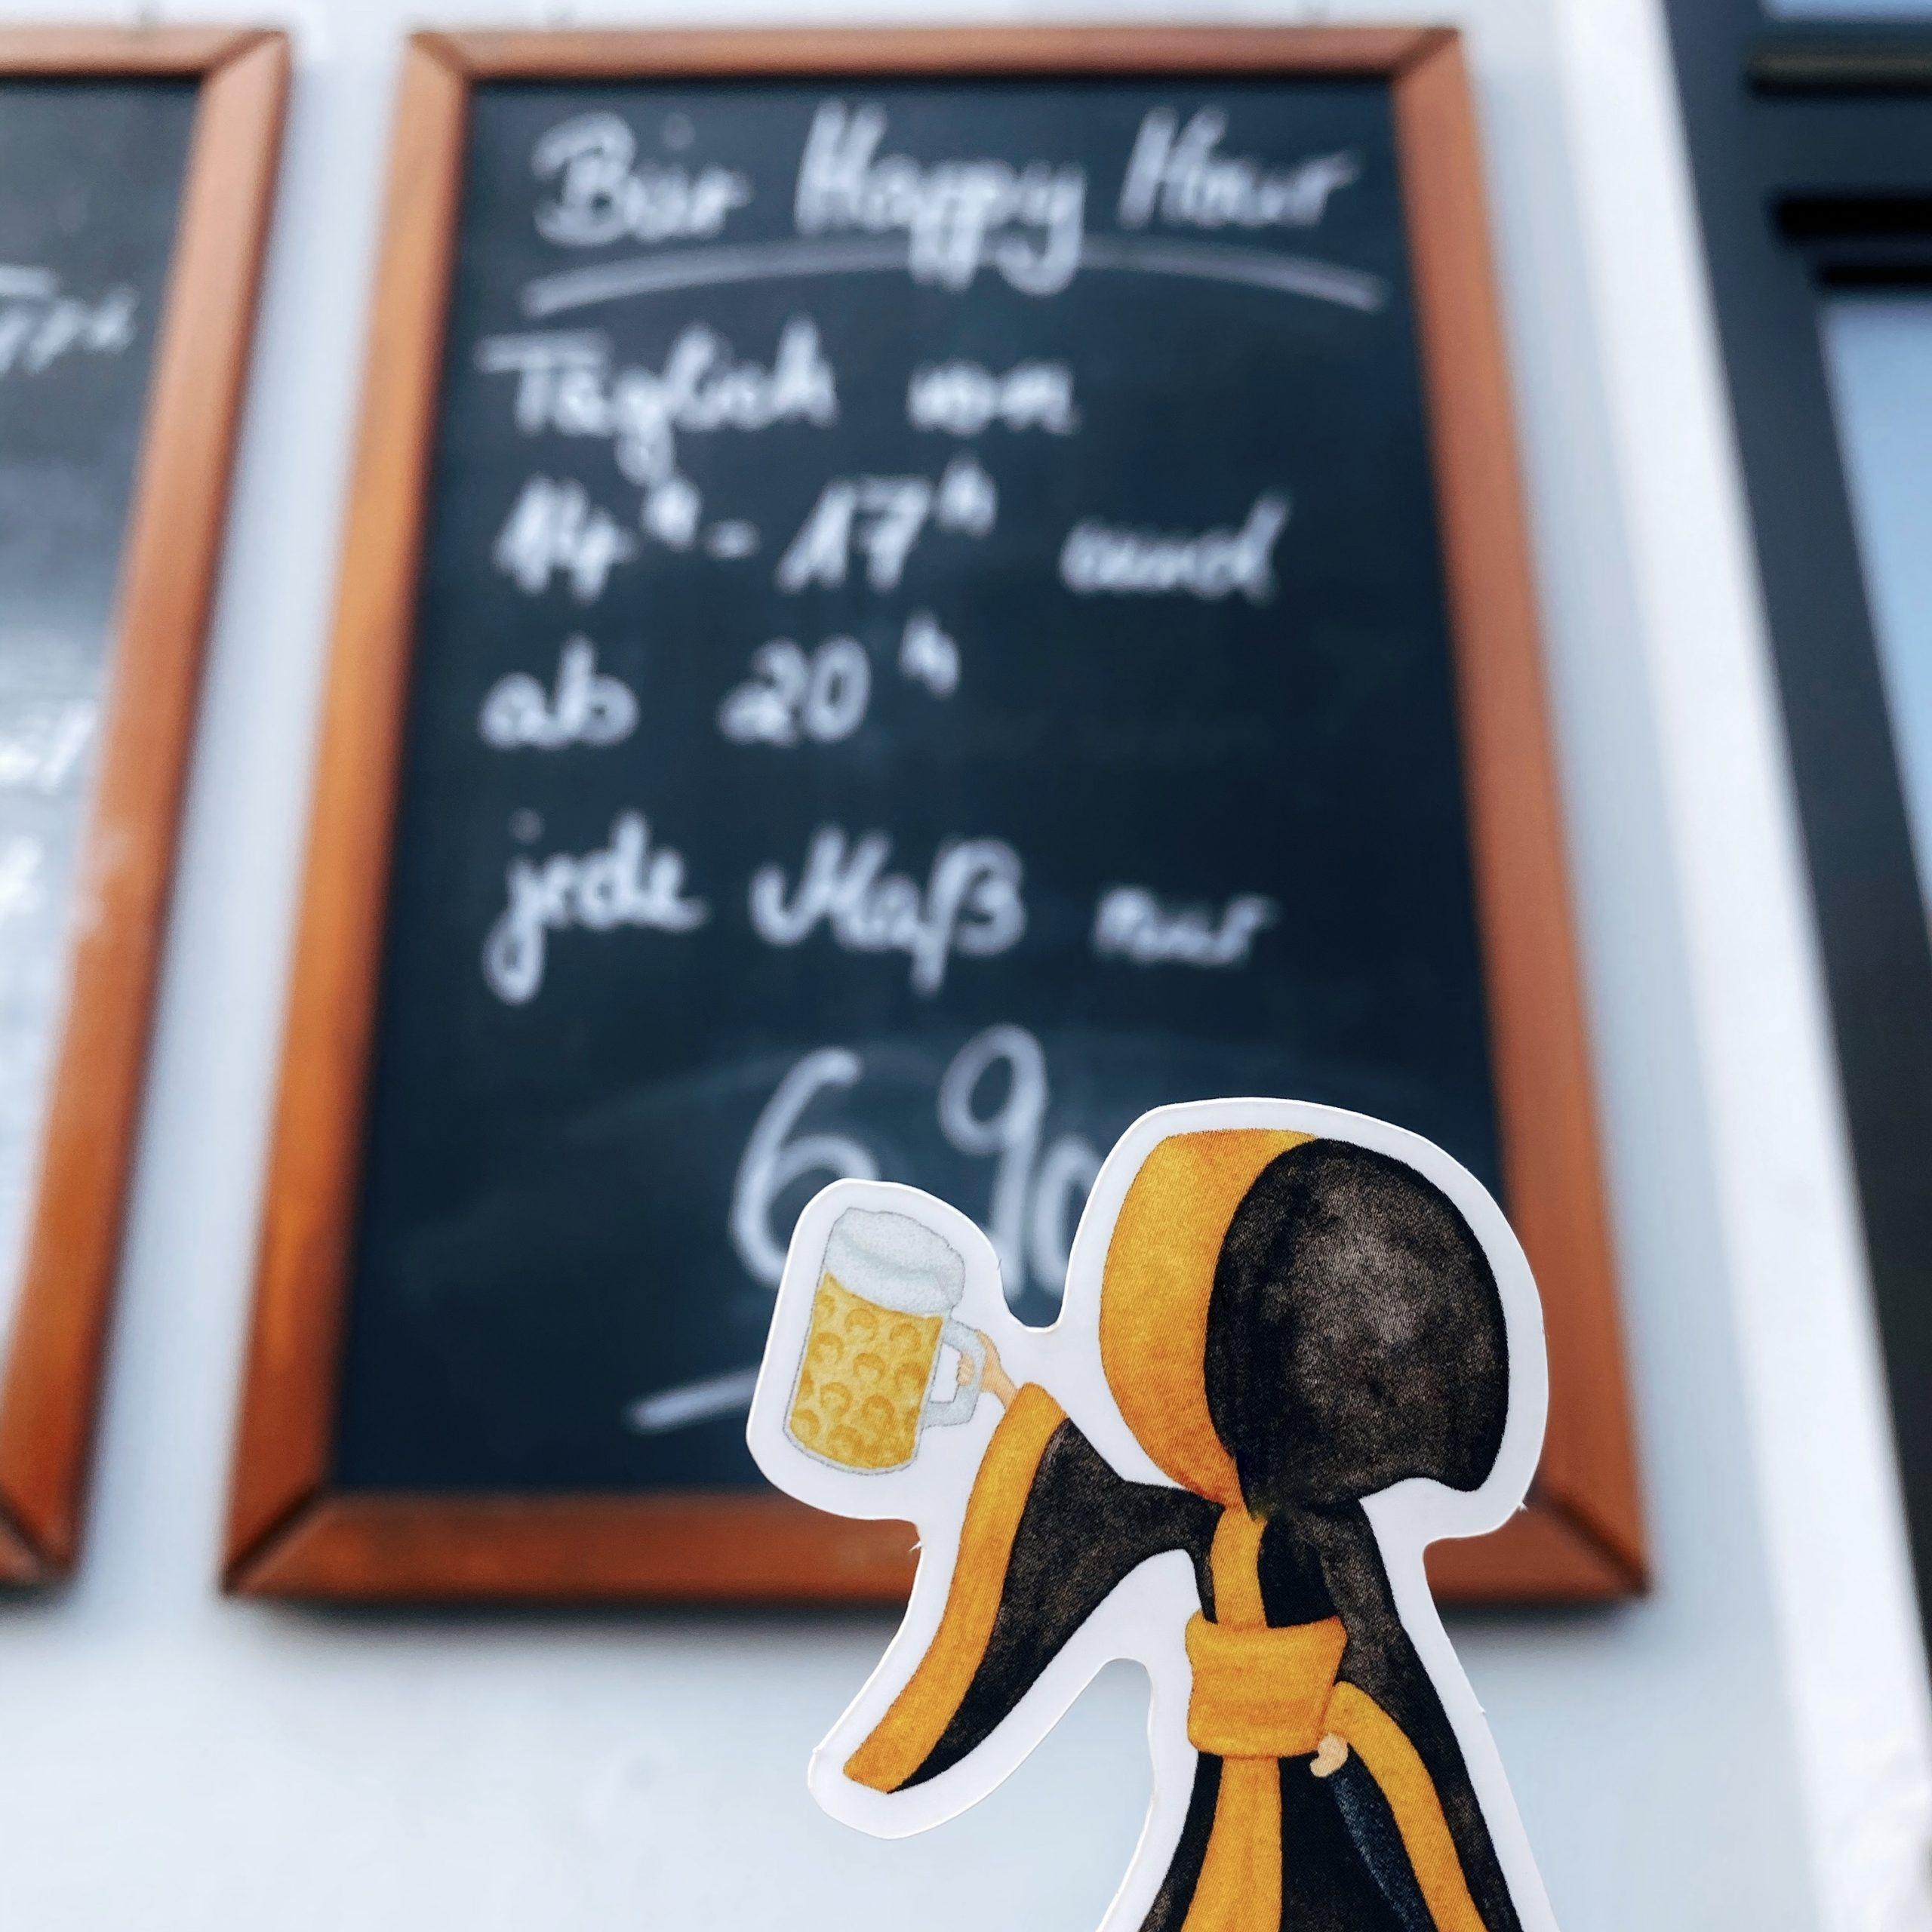 Münchner Kindl mit Maßkrug. Prost vorm Biergarten! - Aufkleber Sticker